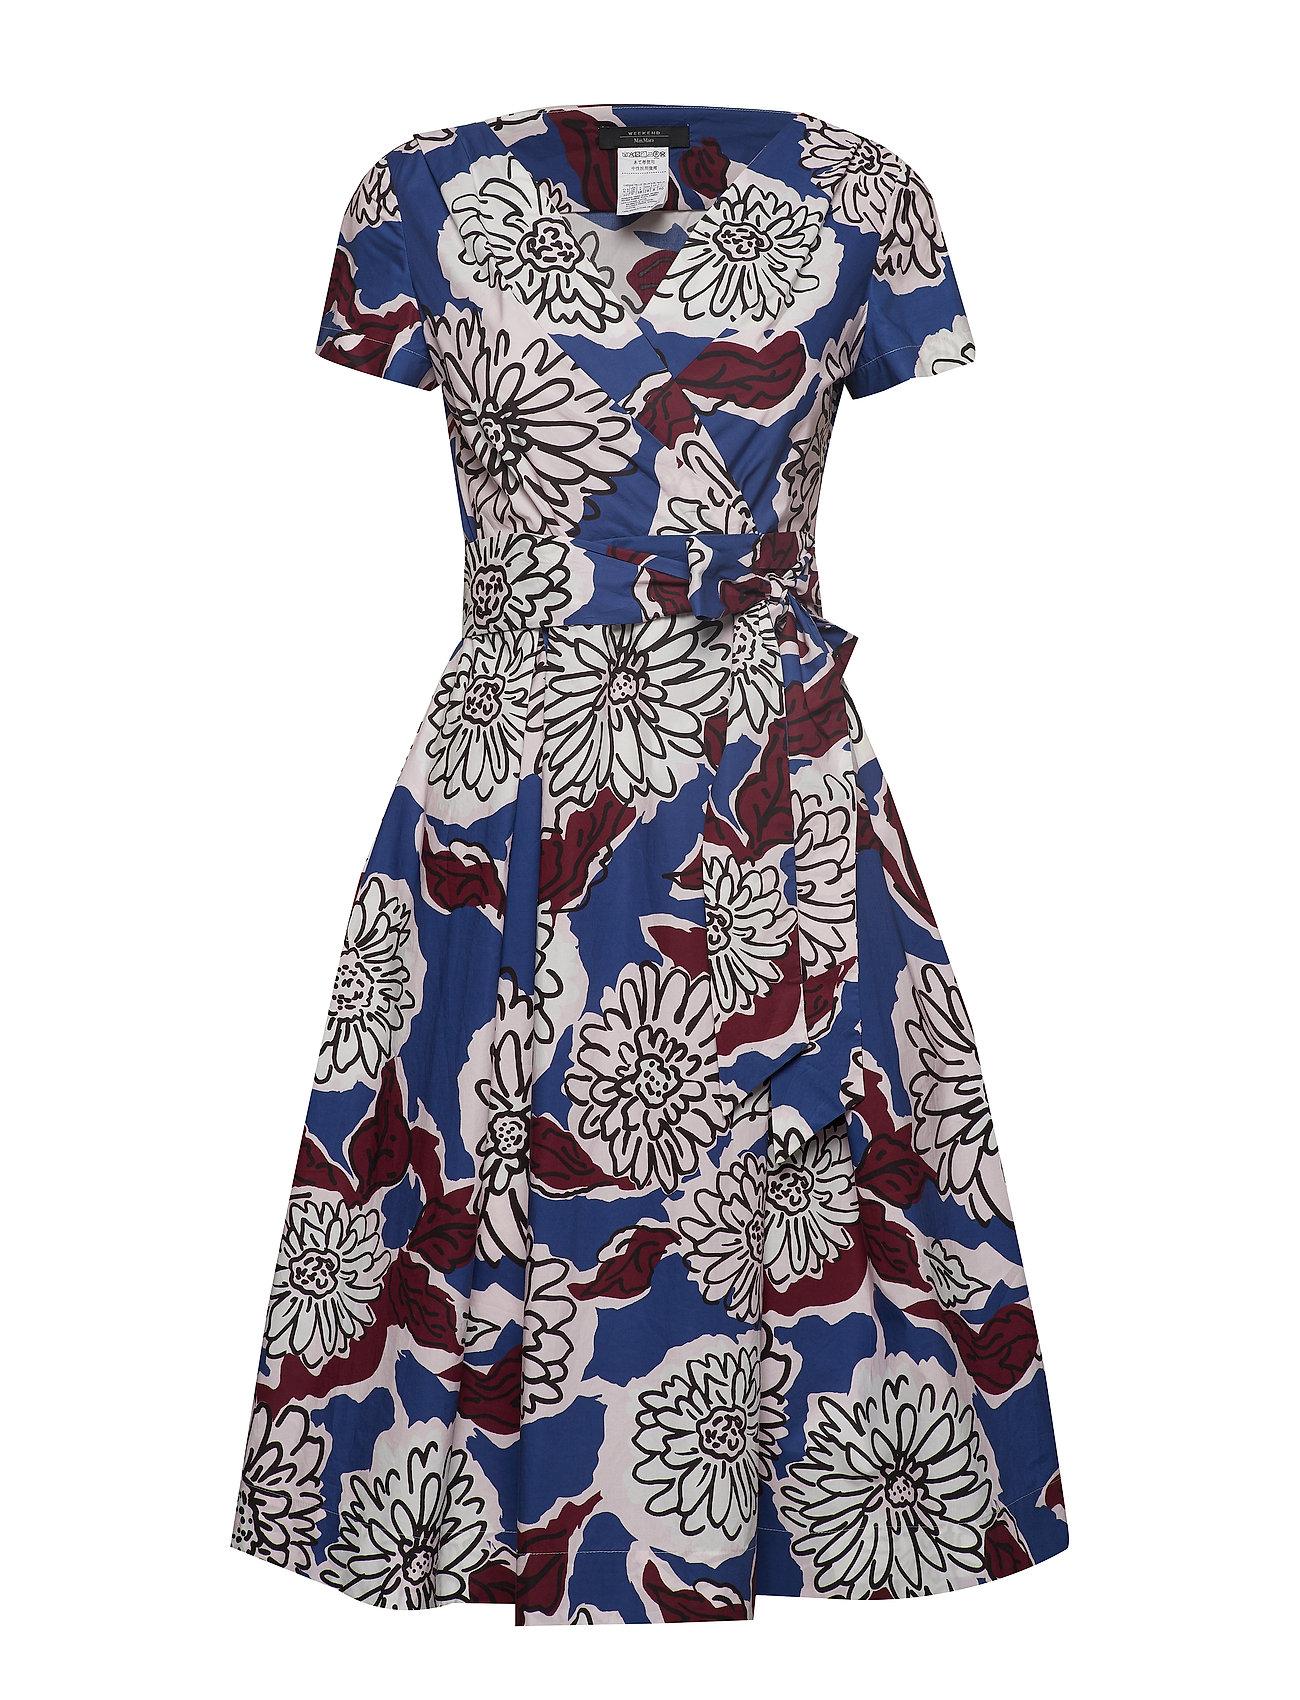 Weekend Max Mara ORONTE - CORNFLOWER BLUE DRESS